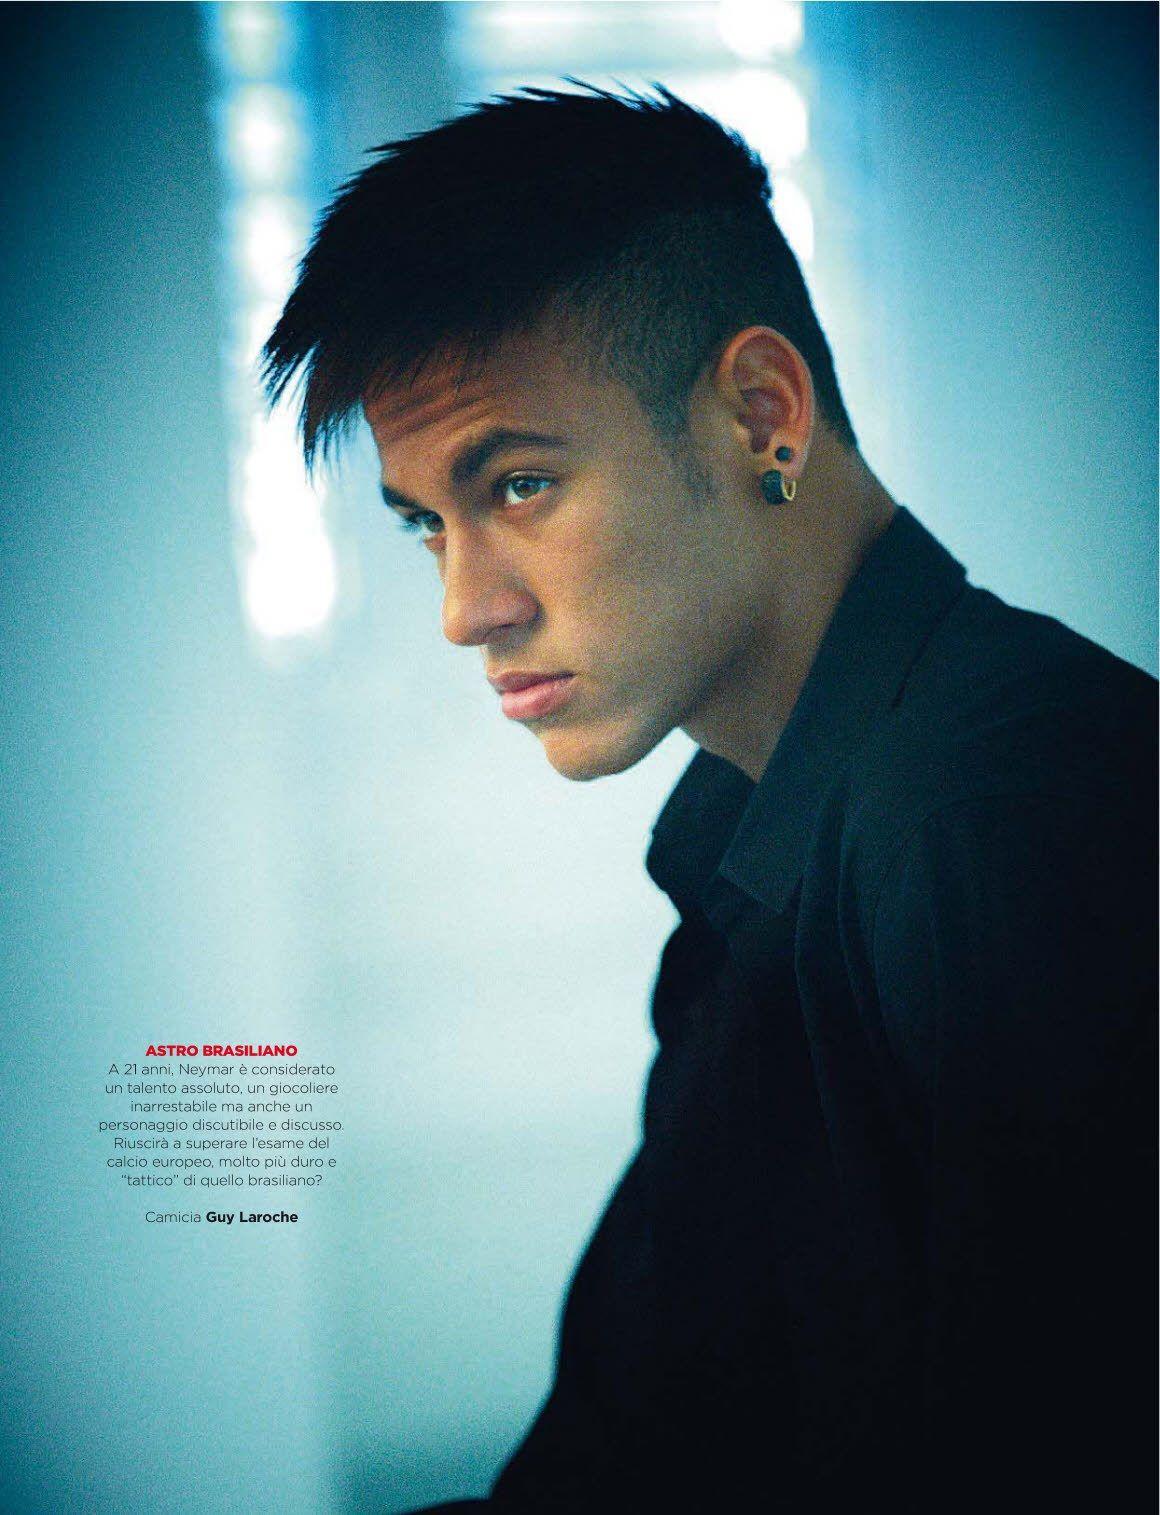 Neymar jr neymar jr pinterest neymar jr neymar and